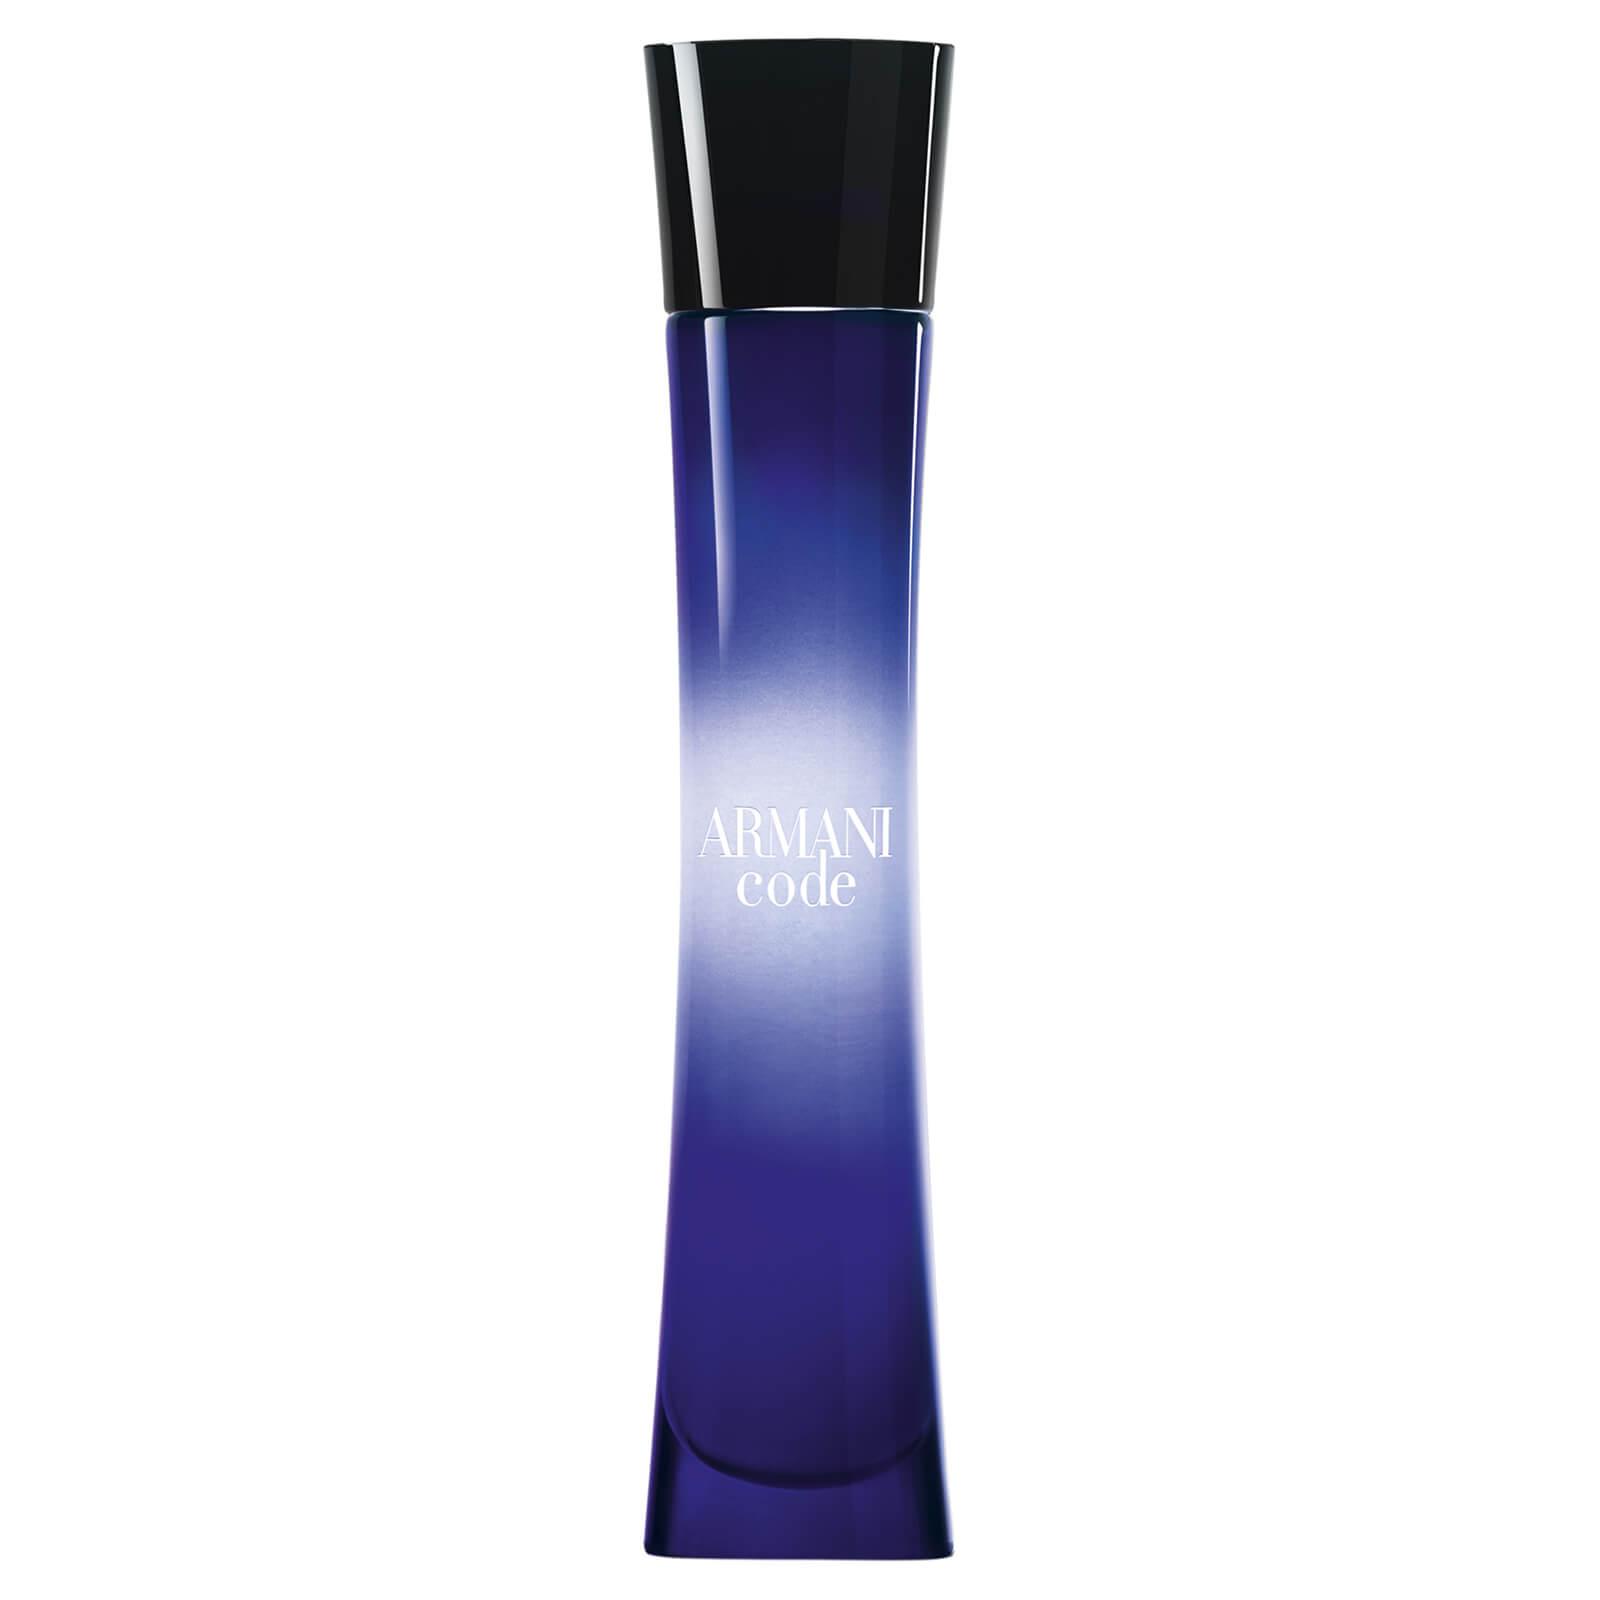 Giorgio Armani Code Femme Eau de Parfum   Free Shipping   Lookfantastic 61490eeb293b